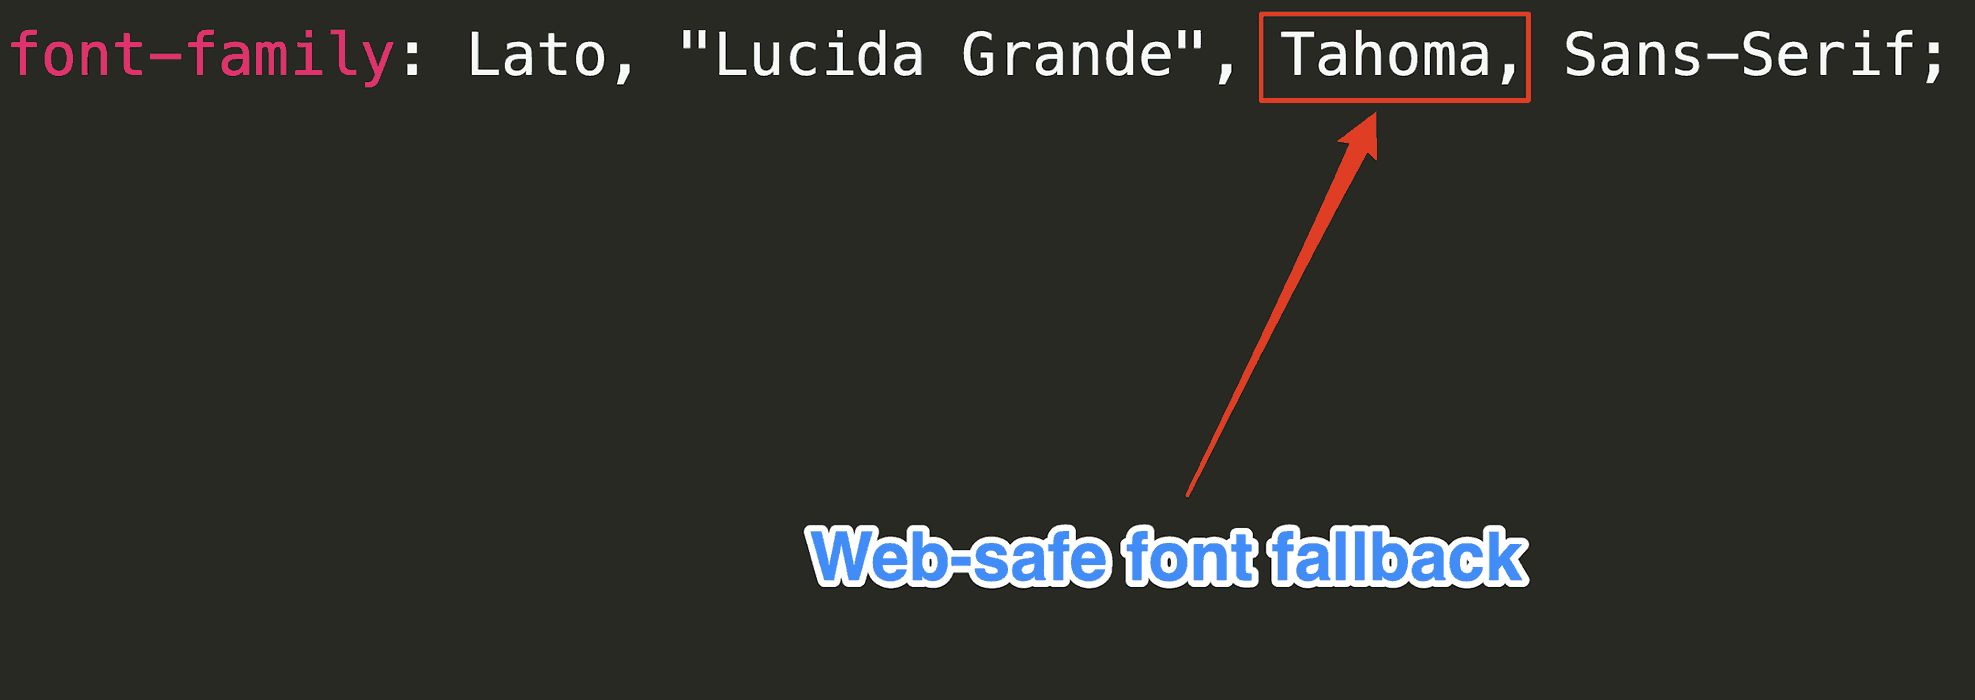 Web safe font fallback